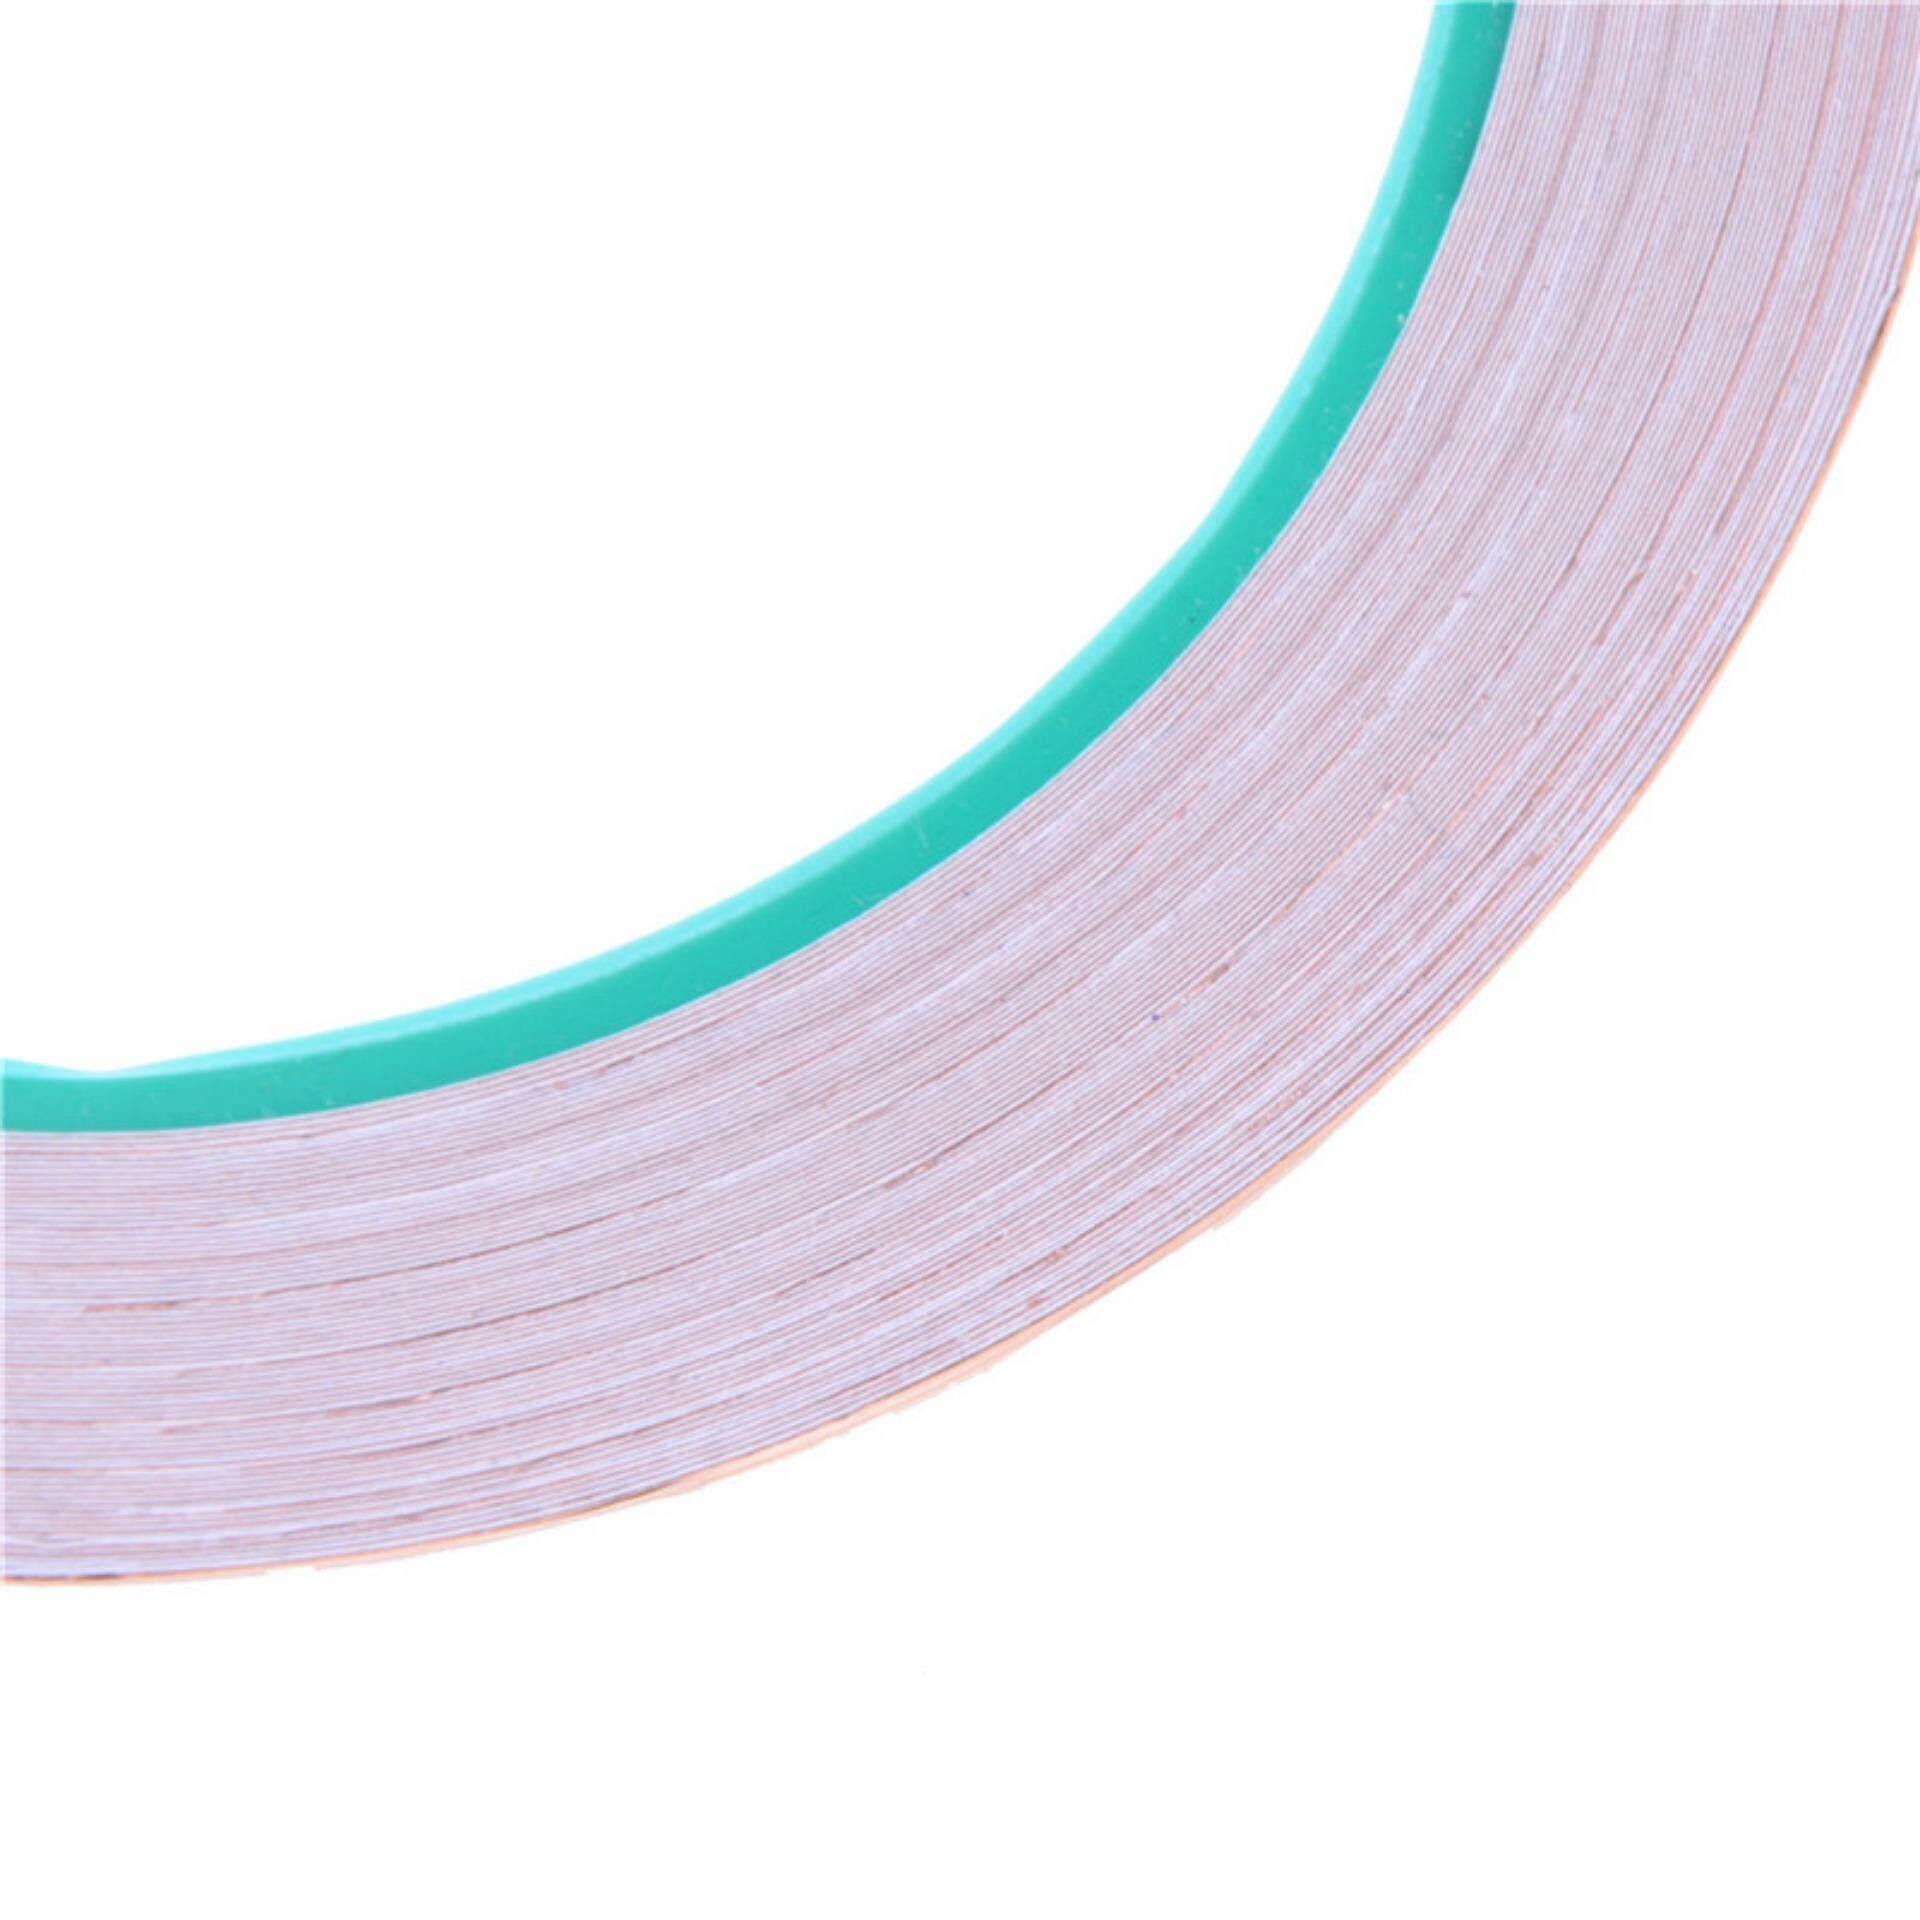 Fitur 5mmx25m Emi Copper Adhesive Foil Tape Self Isolasi Tembaga 50mm X 1m Roll Intl